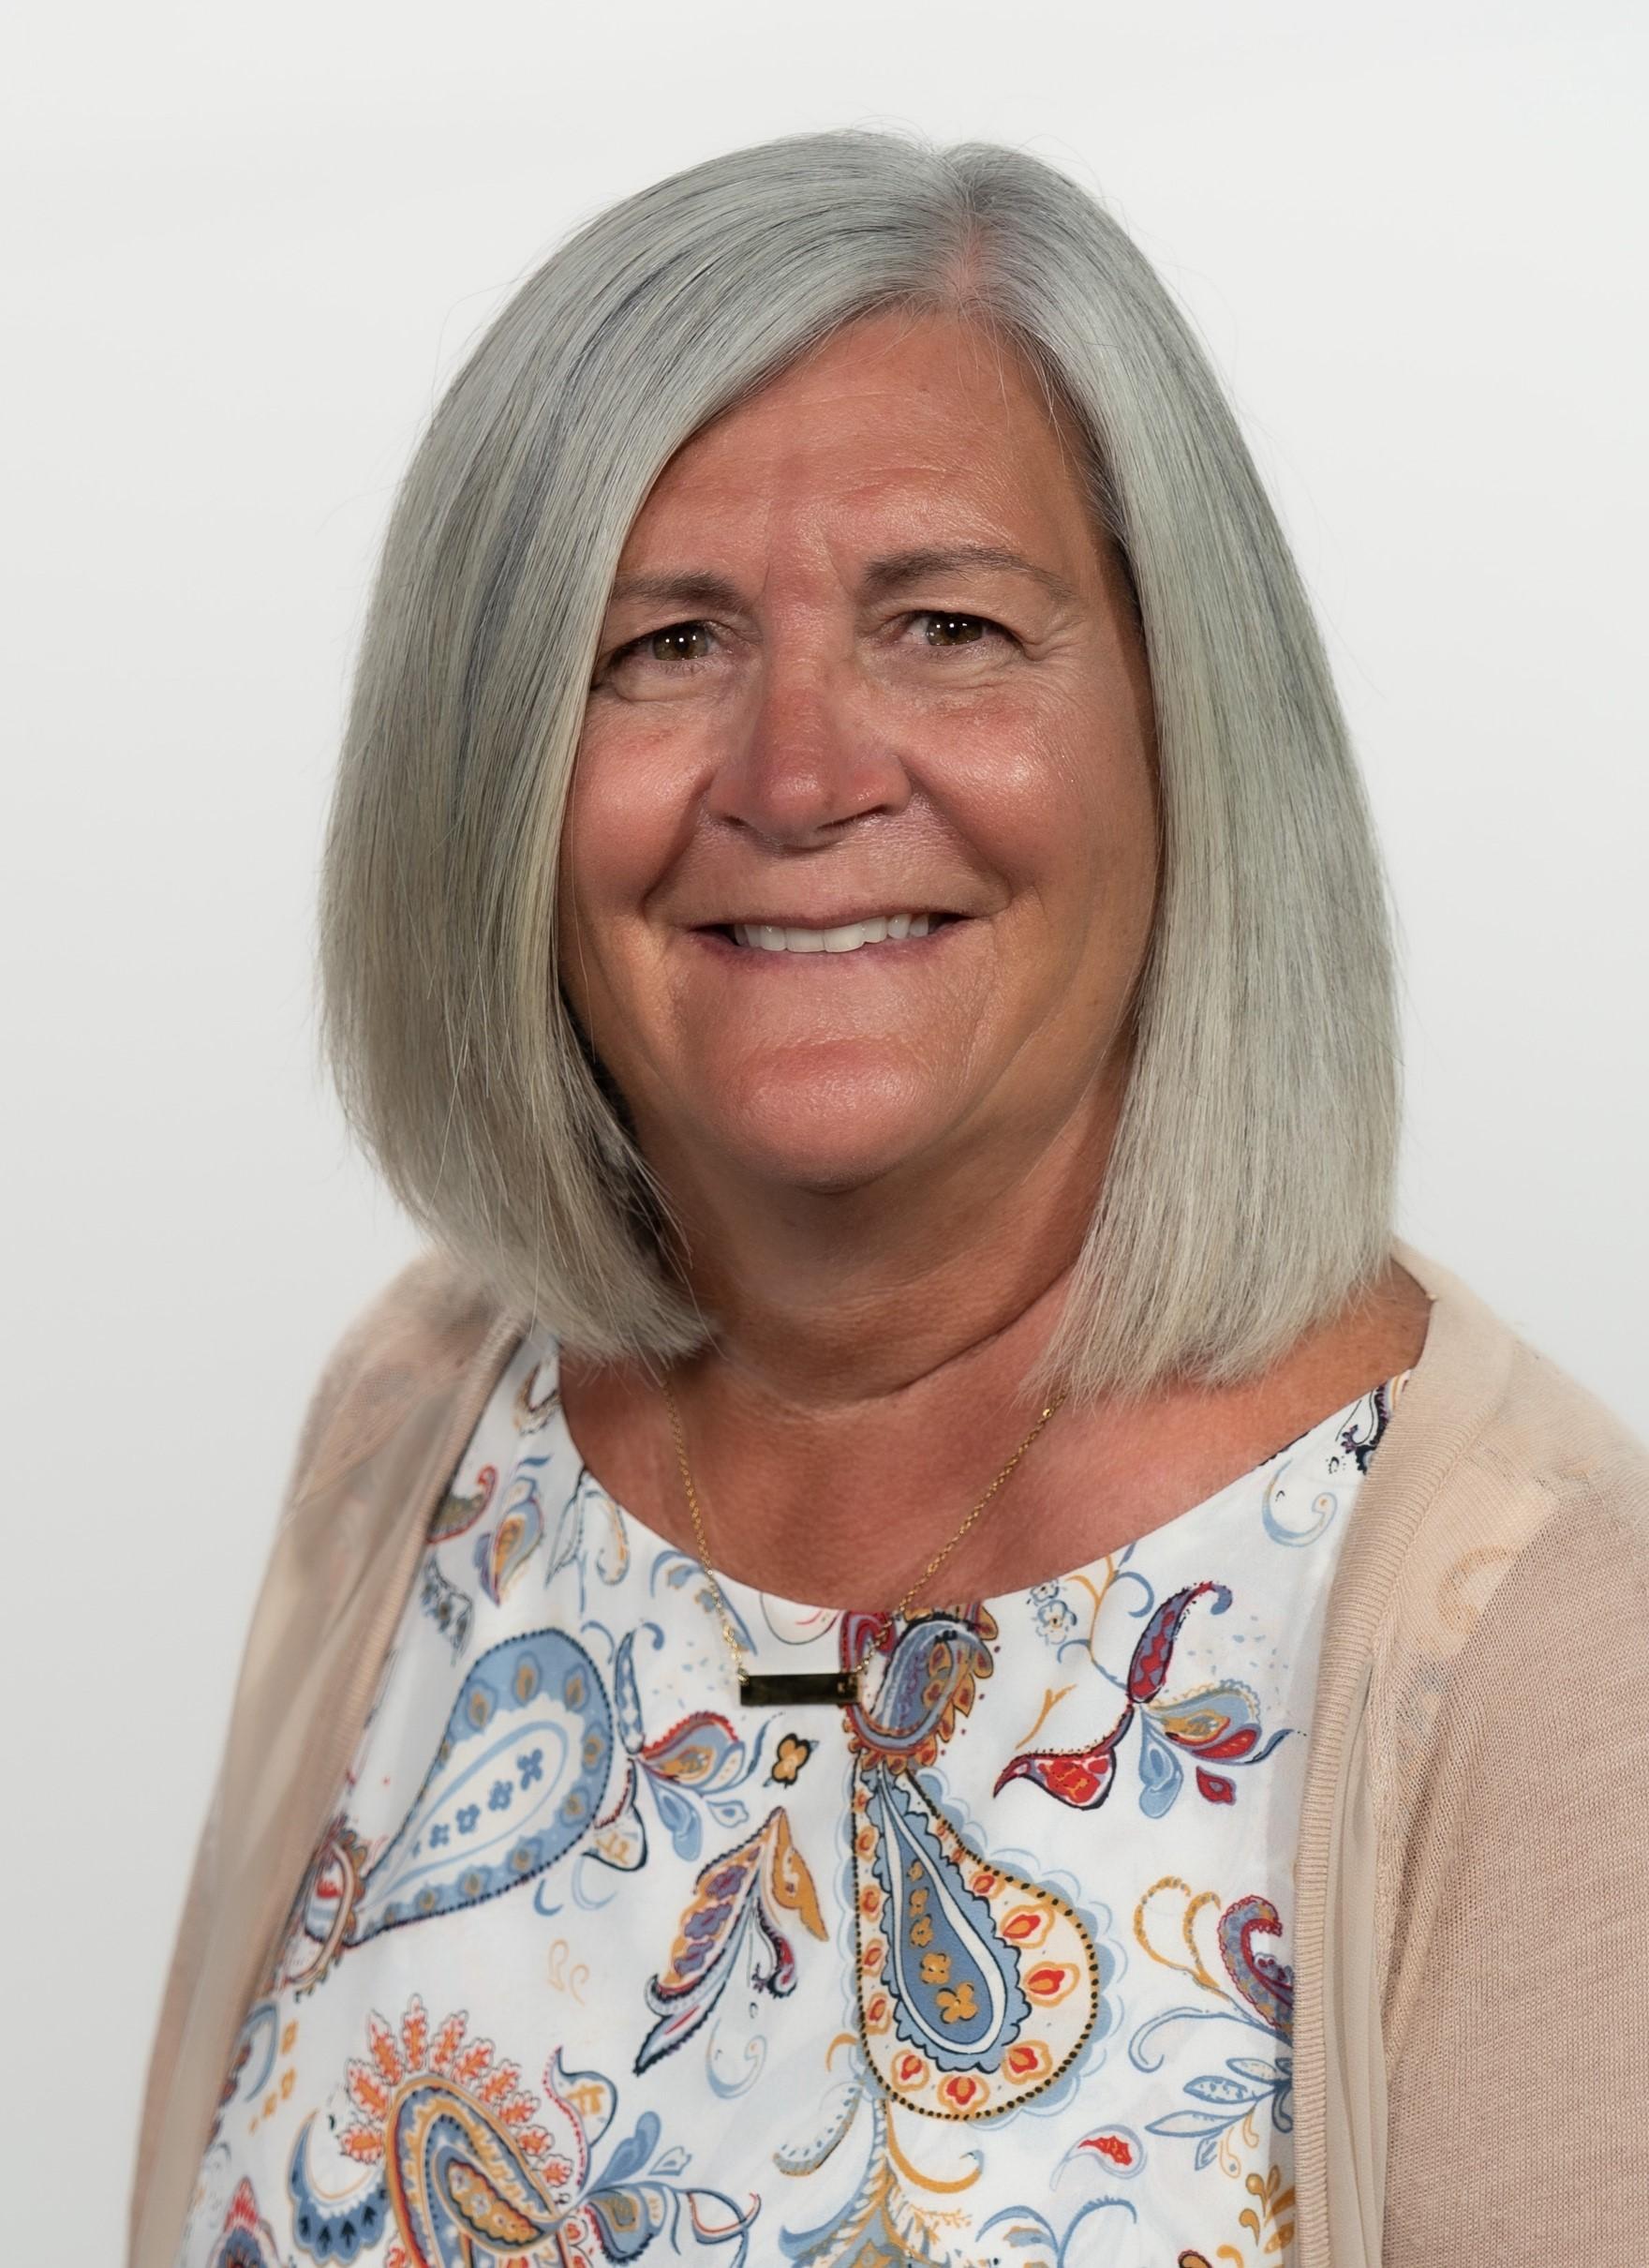 Karen Menard, PhD, OTR/L